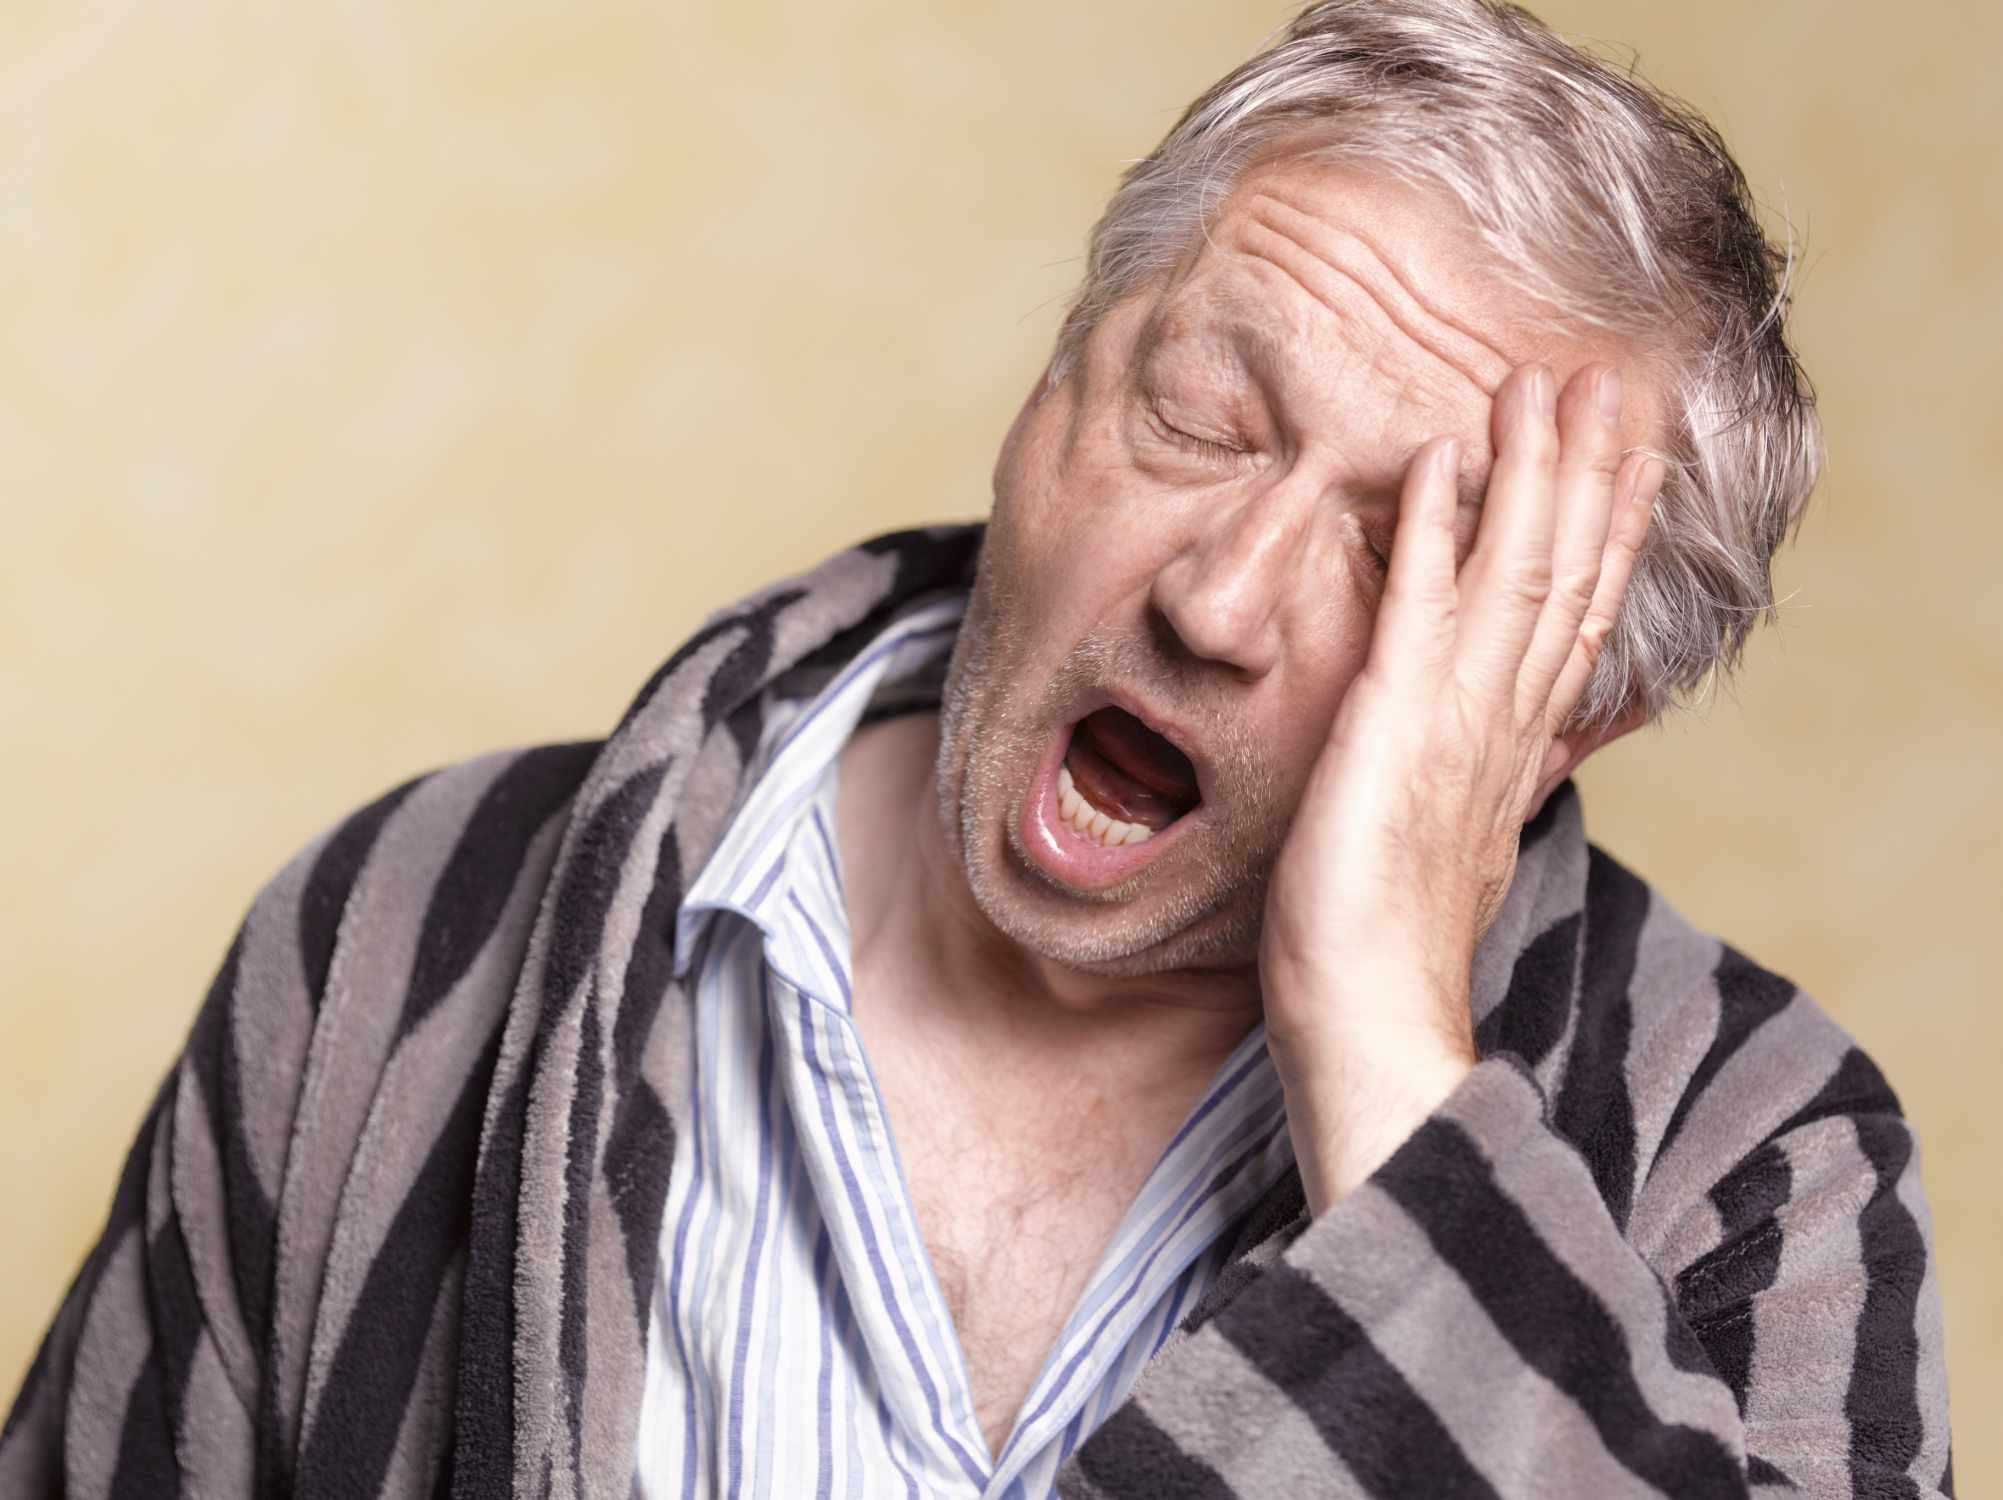 Older man yawning in a robe and pajamas